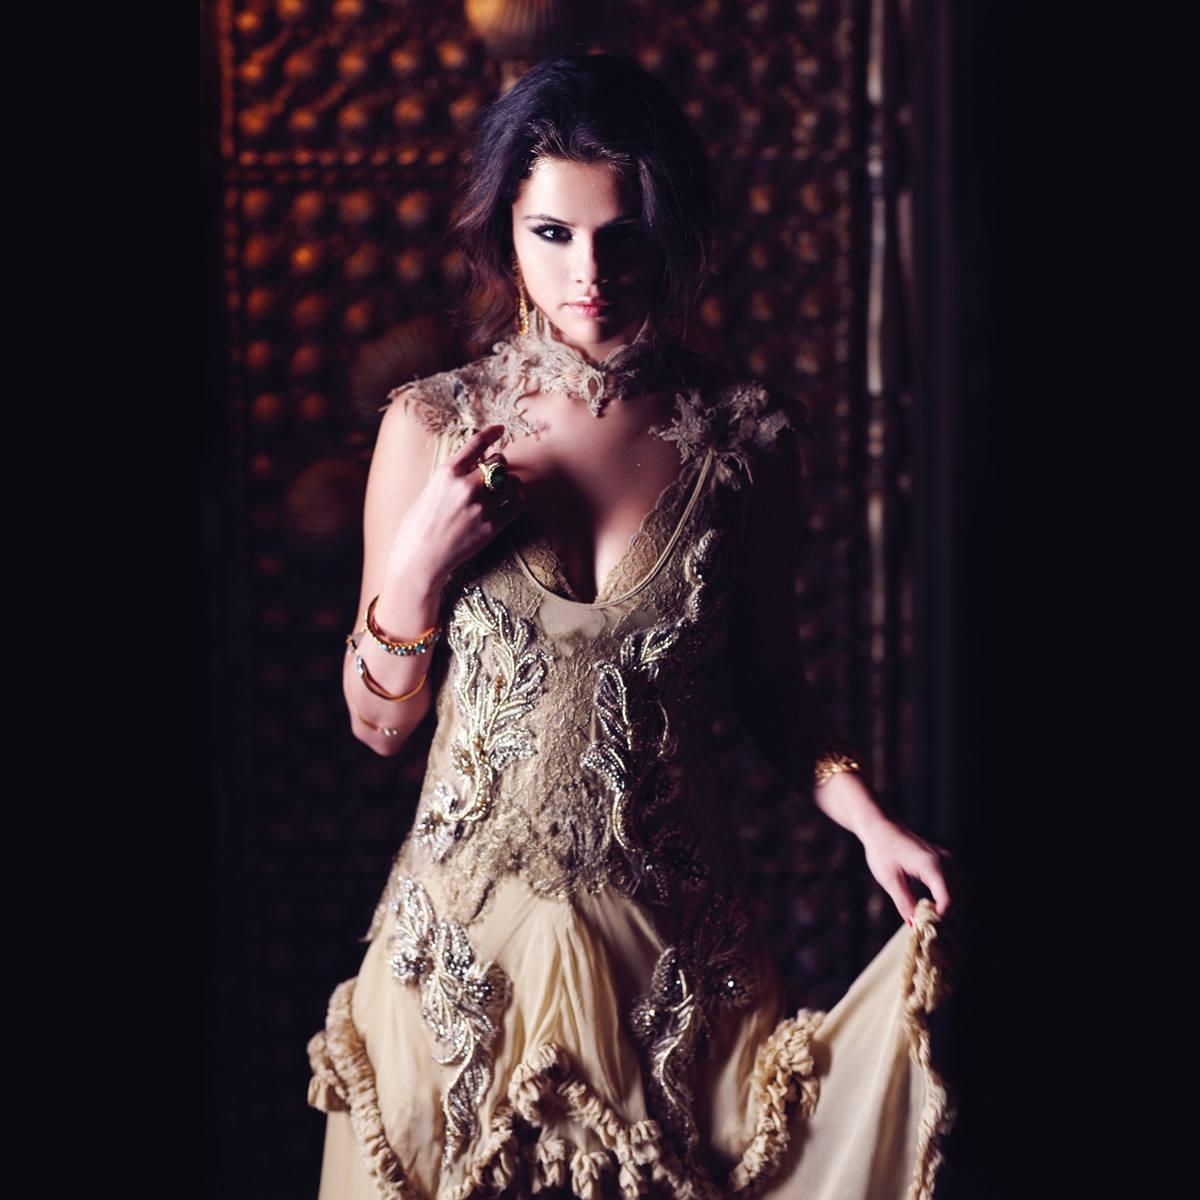 Selena gomez stars dance album photoshoot 07 gotceleb selena gomez stars dance album photoshoot 07 voltagebd Image collections